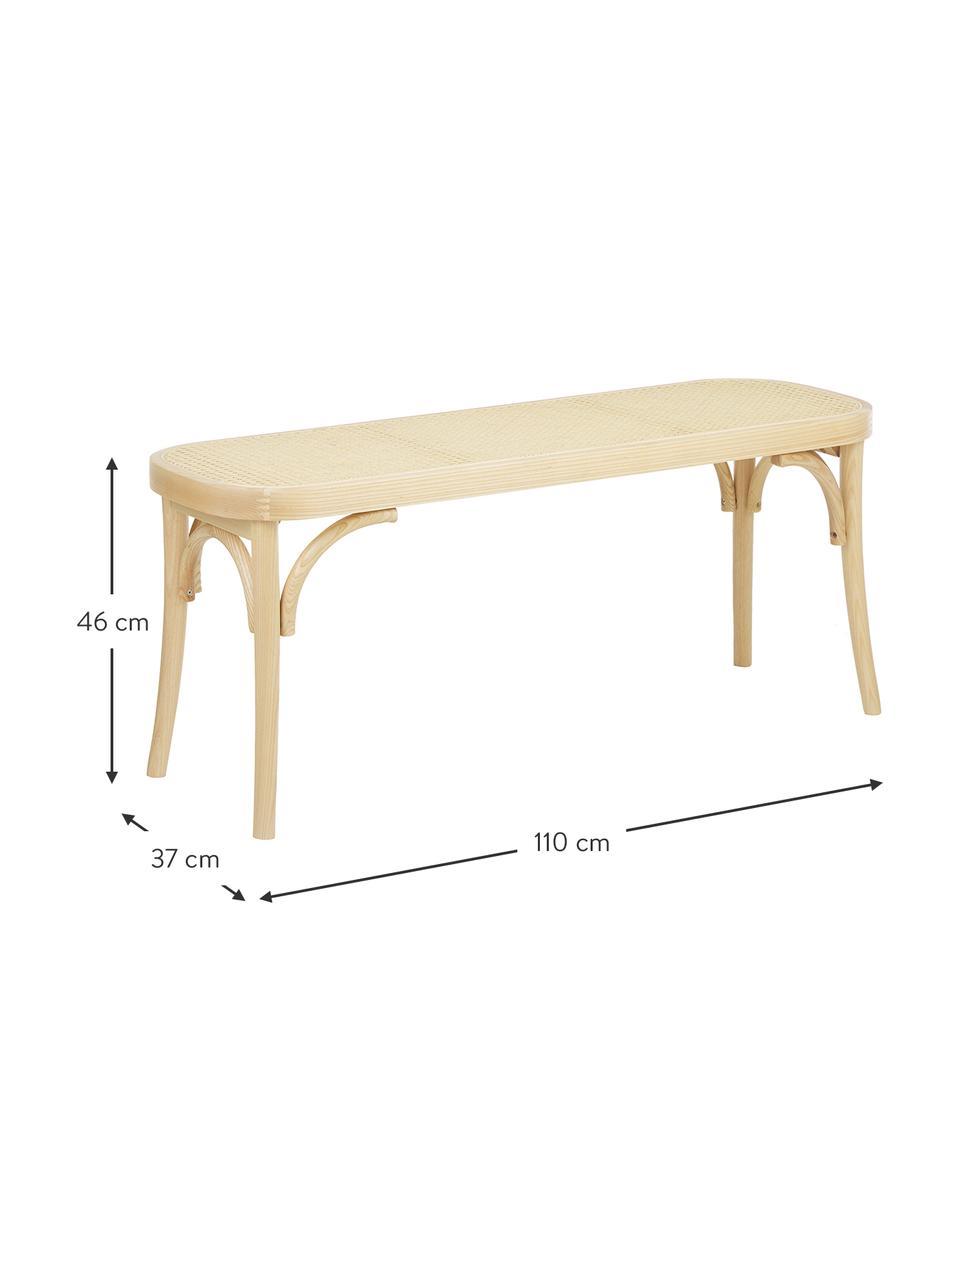 Sitzbank Franz mit Wiener Geflecht, Sitzfläche: Rattan, Gestell: Buchenholz, massiv, Helles Holz, 110 x 47 cm